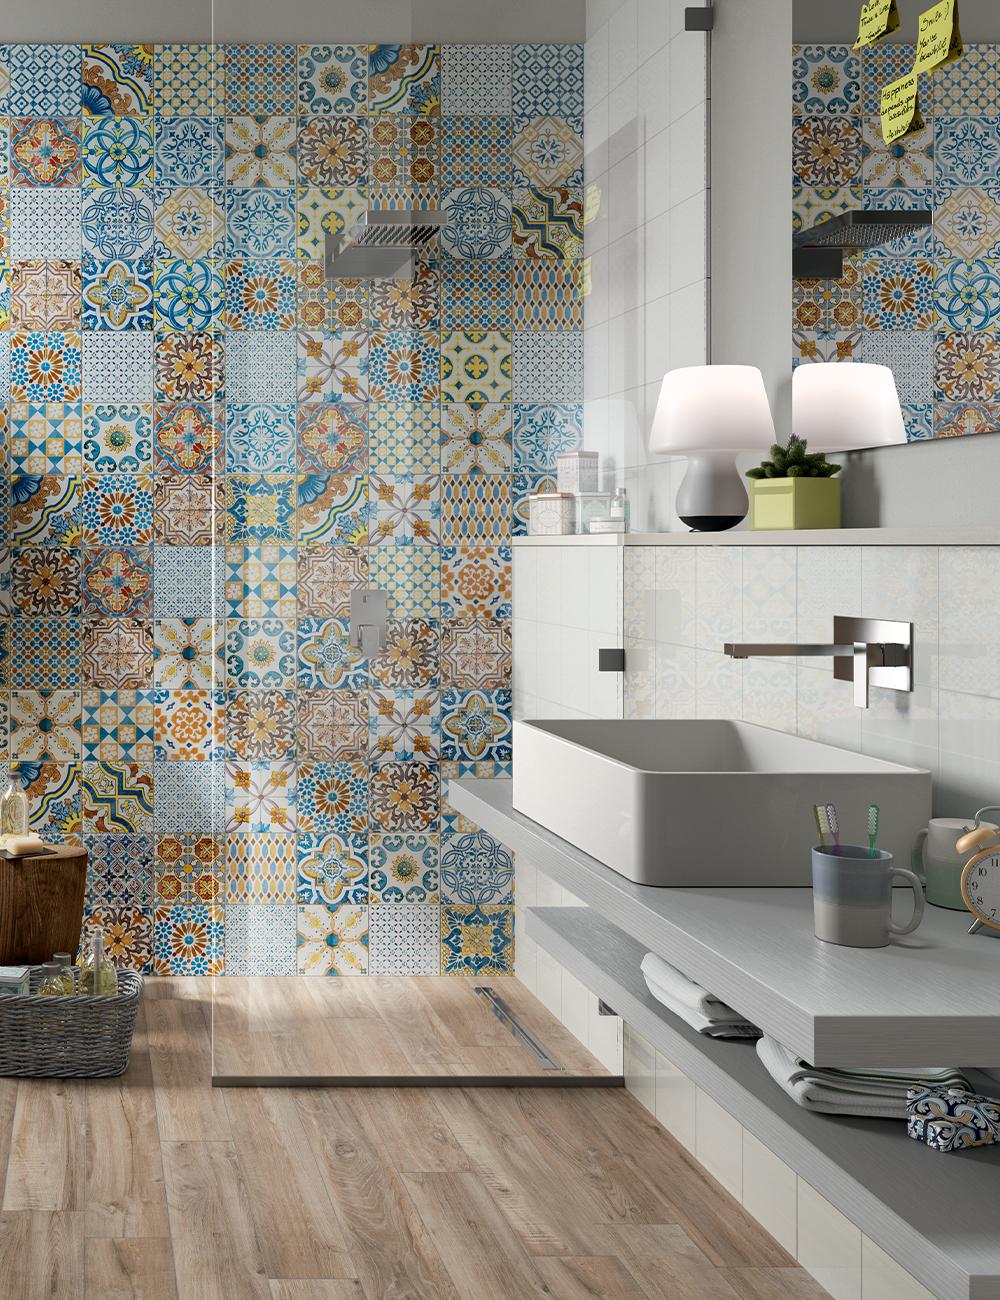 Photo of Rivestimento Bagno Lucido in Bicottura Effetto Patchwork Azulejos 20X20